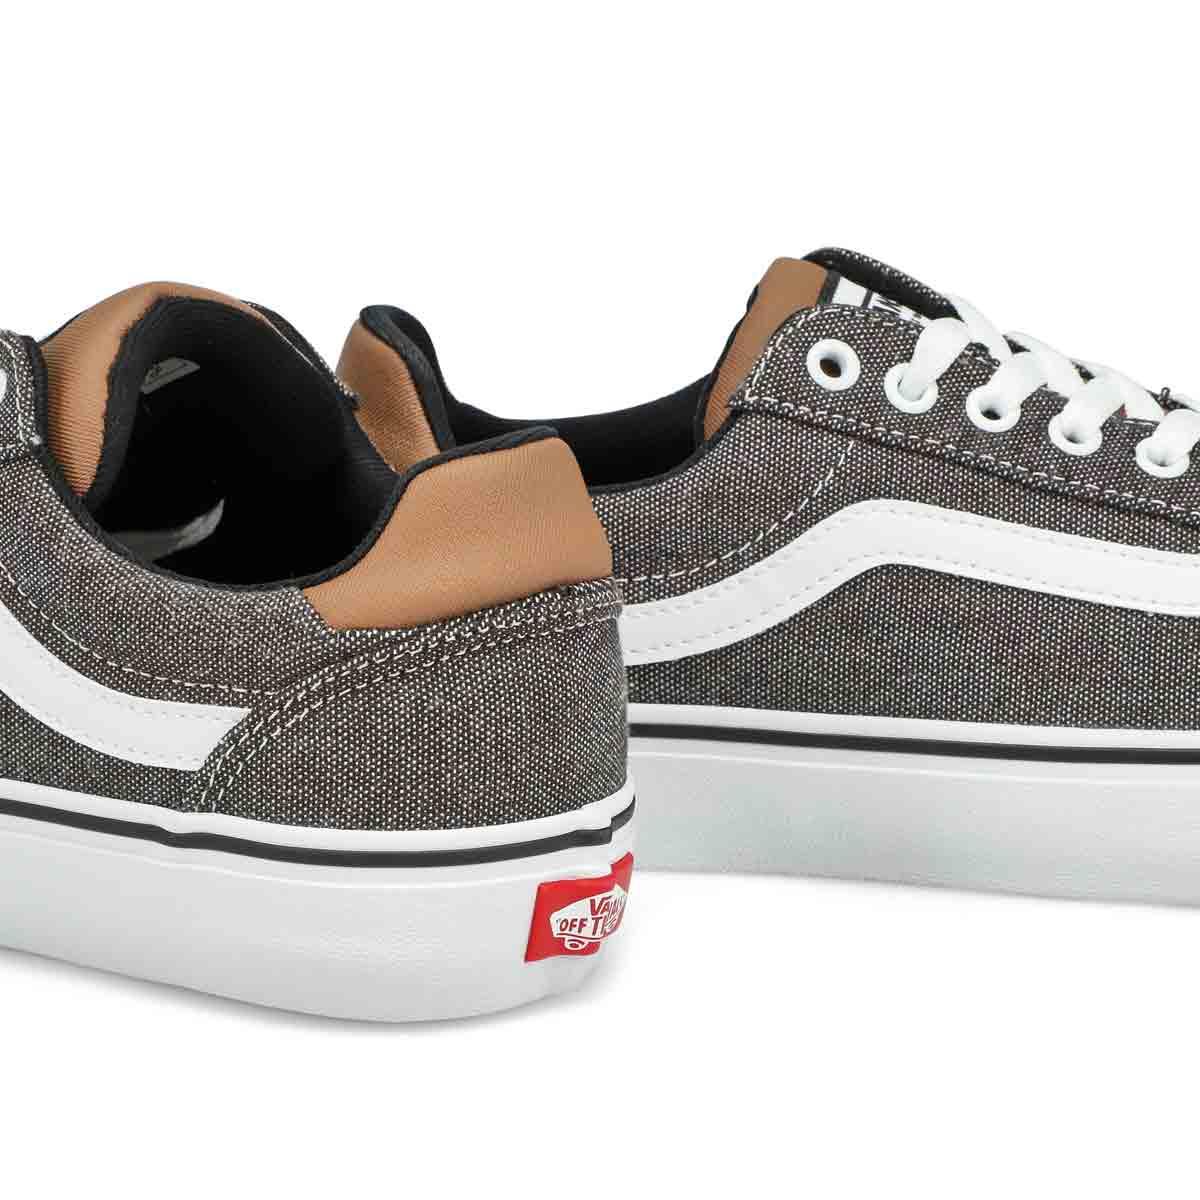 Men's Ward Deluxe Sneaker - Black/White